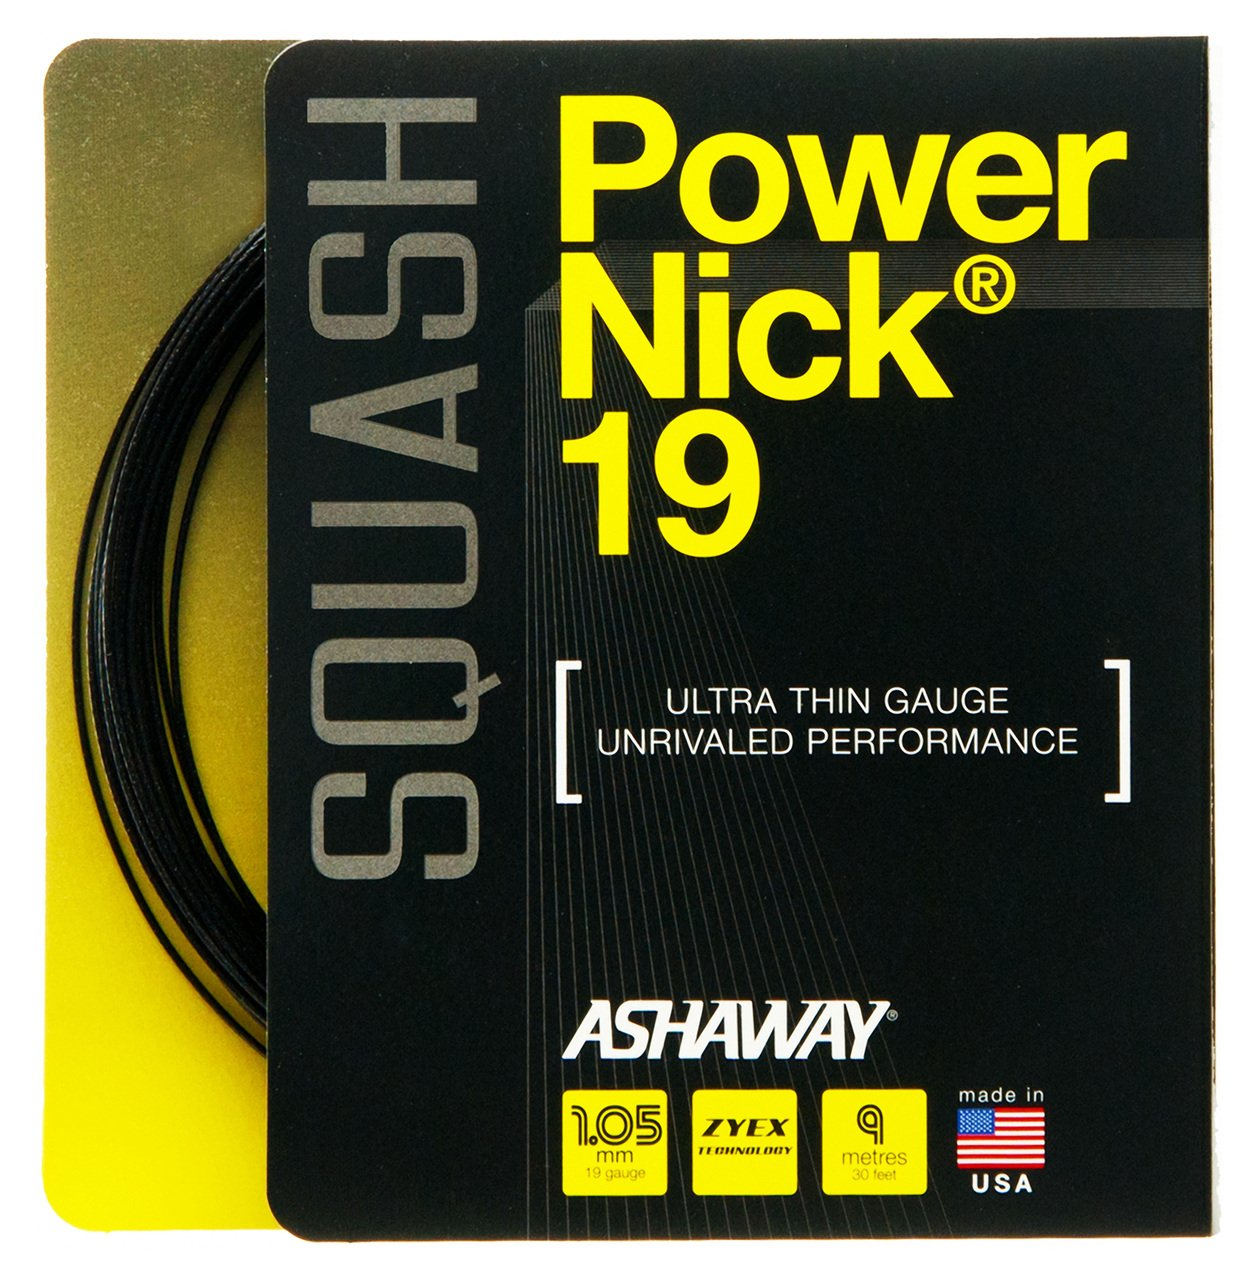 Ashaway PowerNick 19 Squash String Set - Black